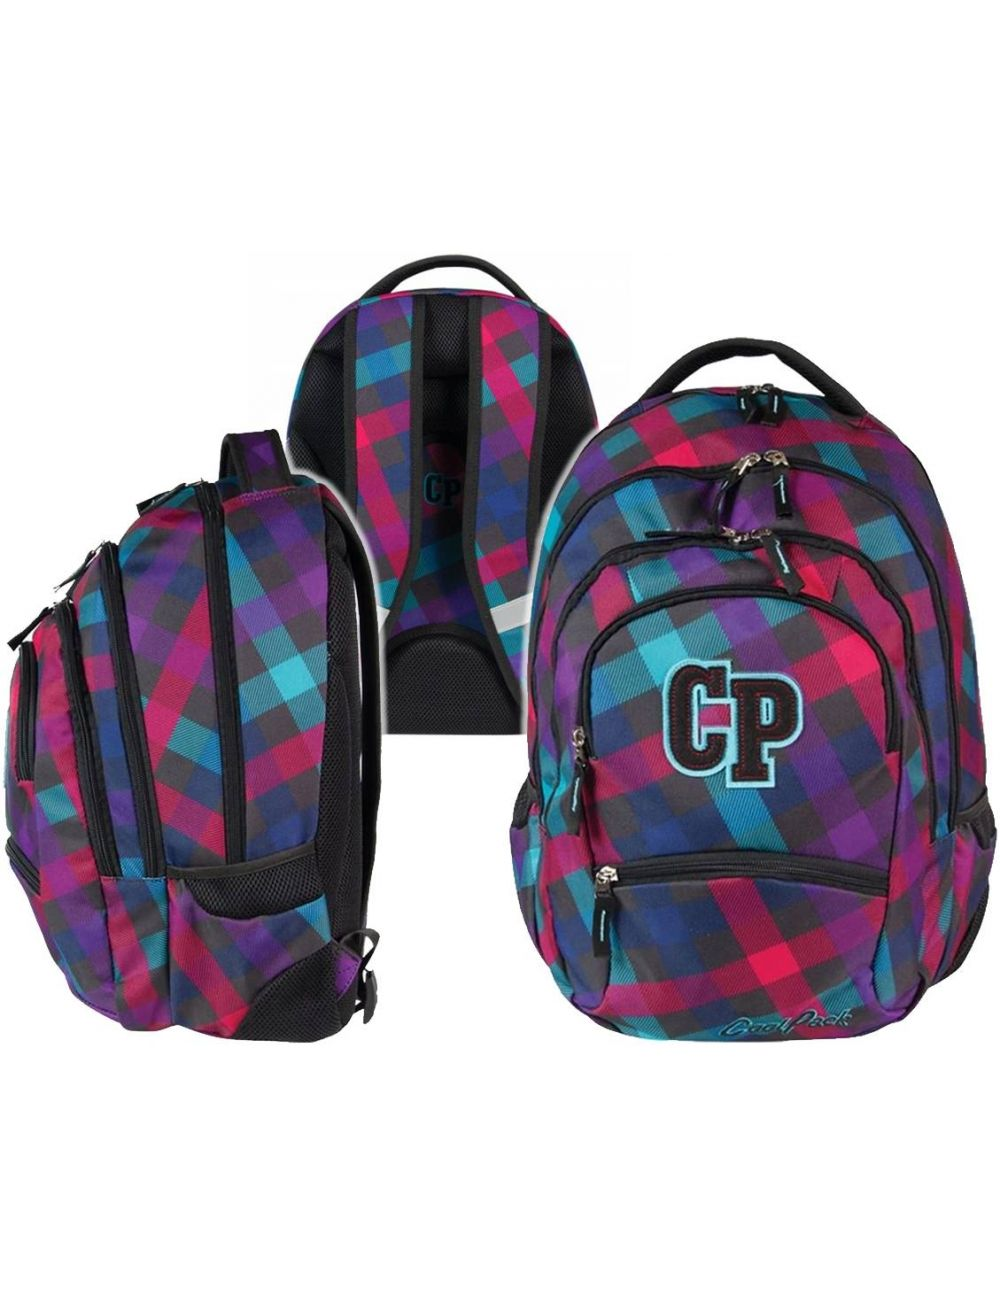 Coolpack College Electra 161 plecak szkolny